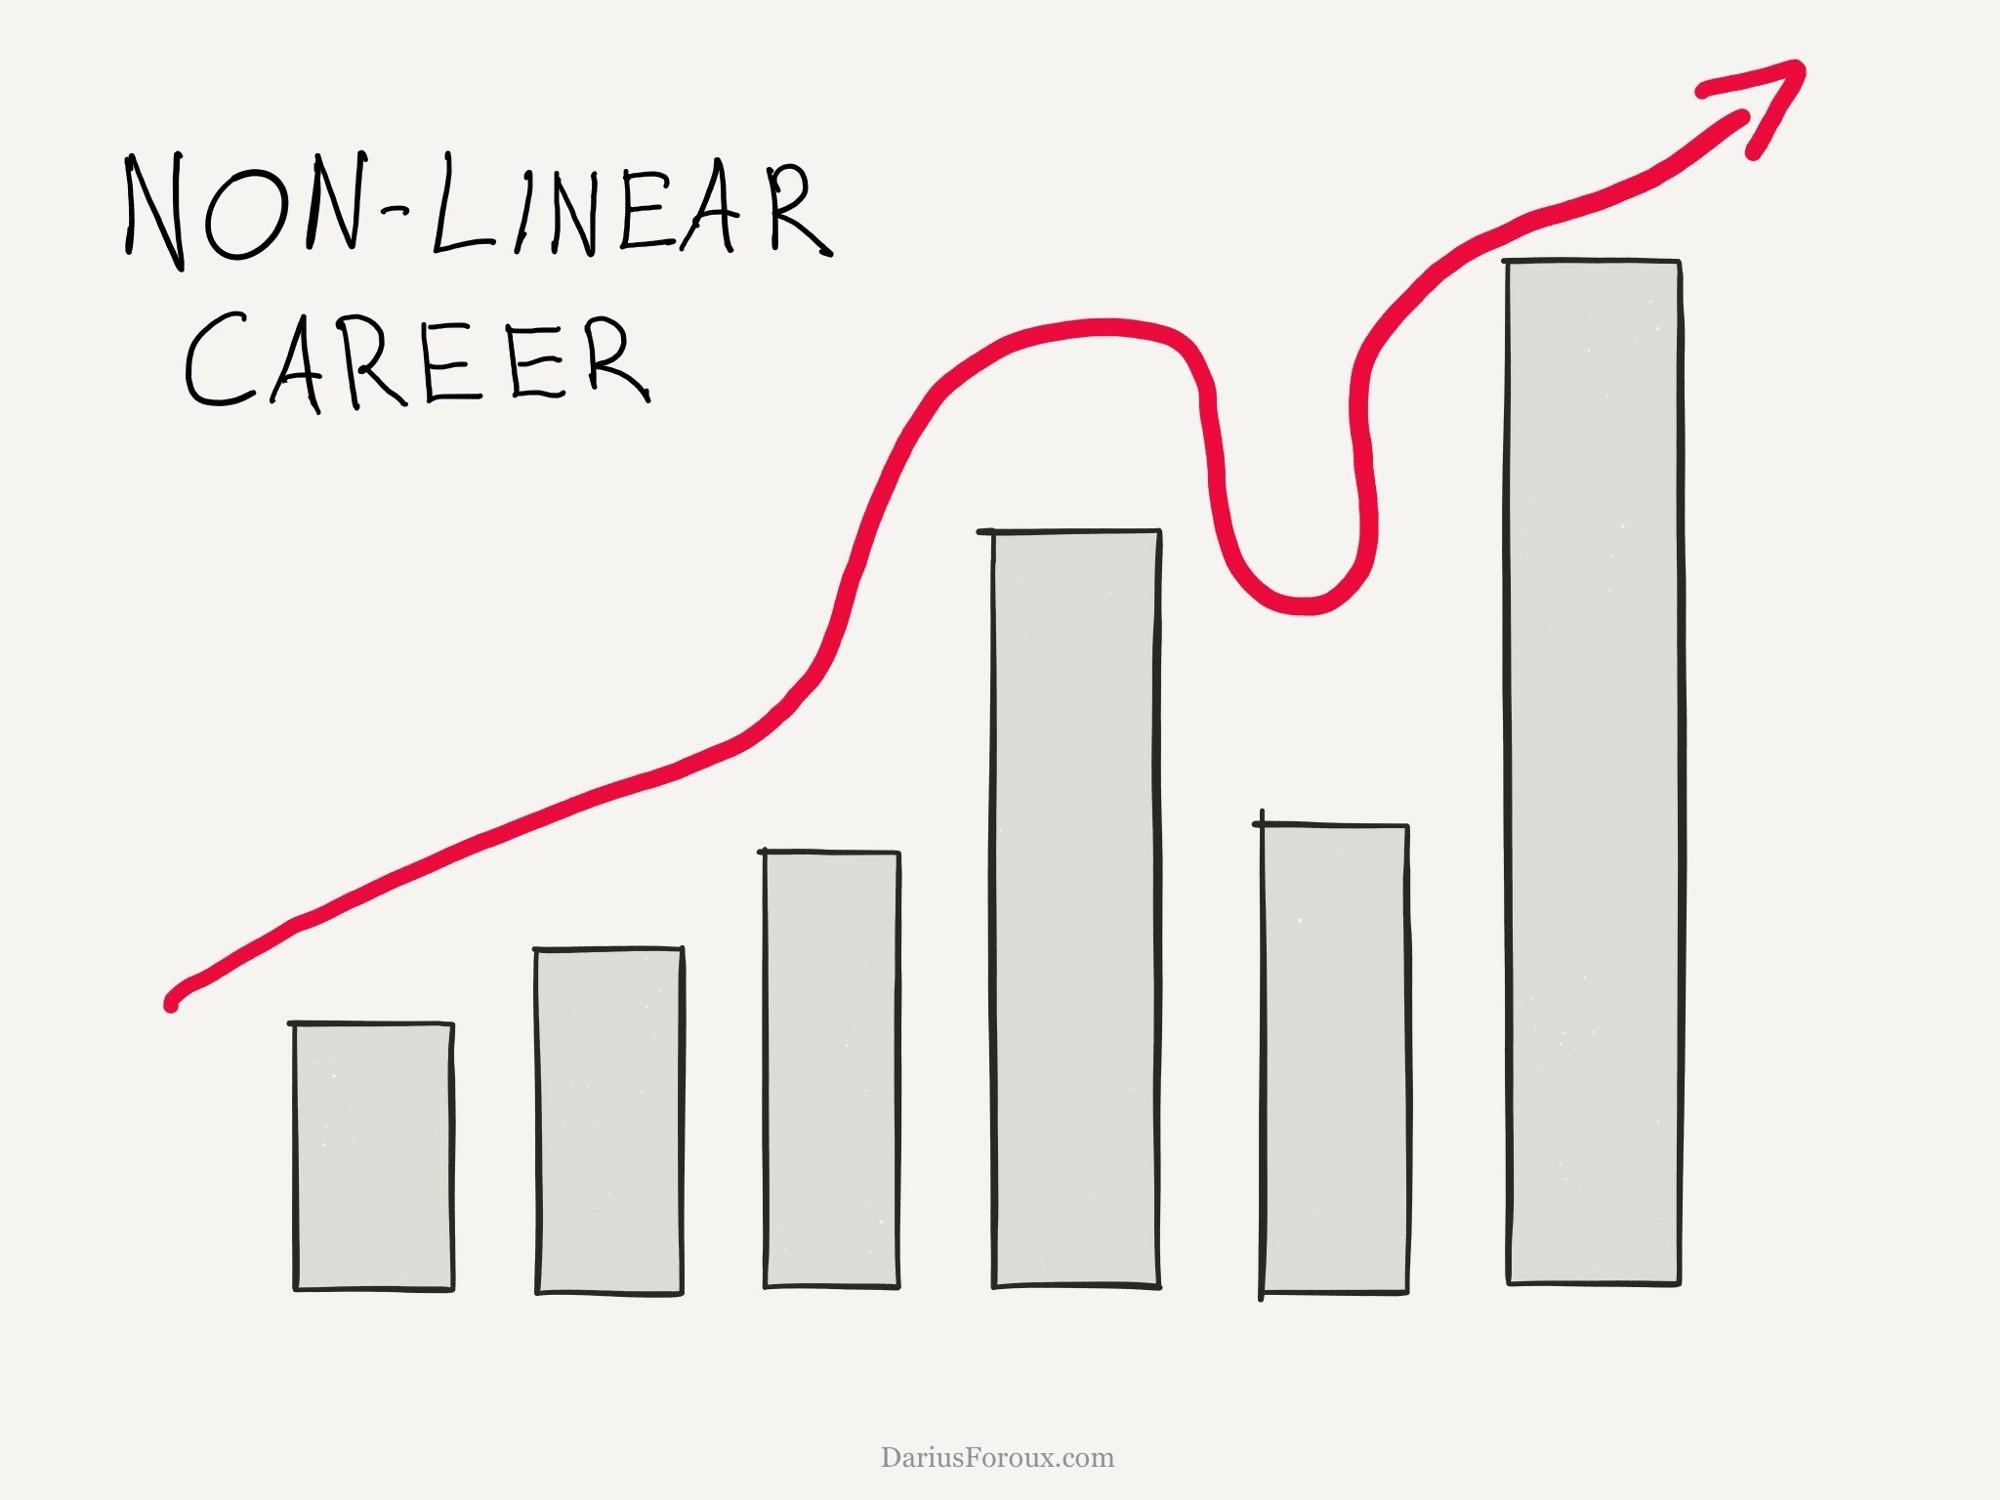 The non-linear career